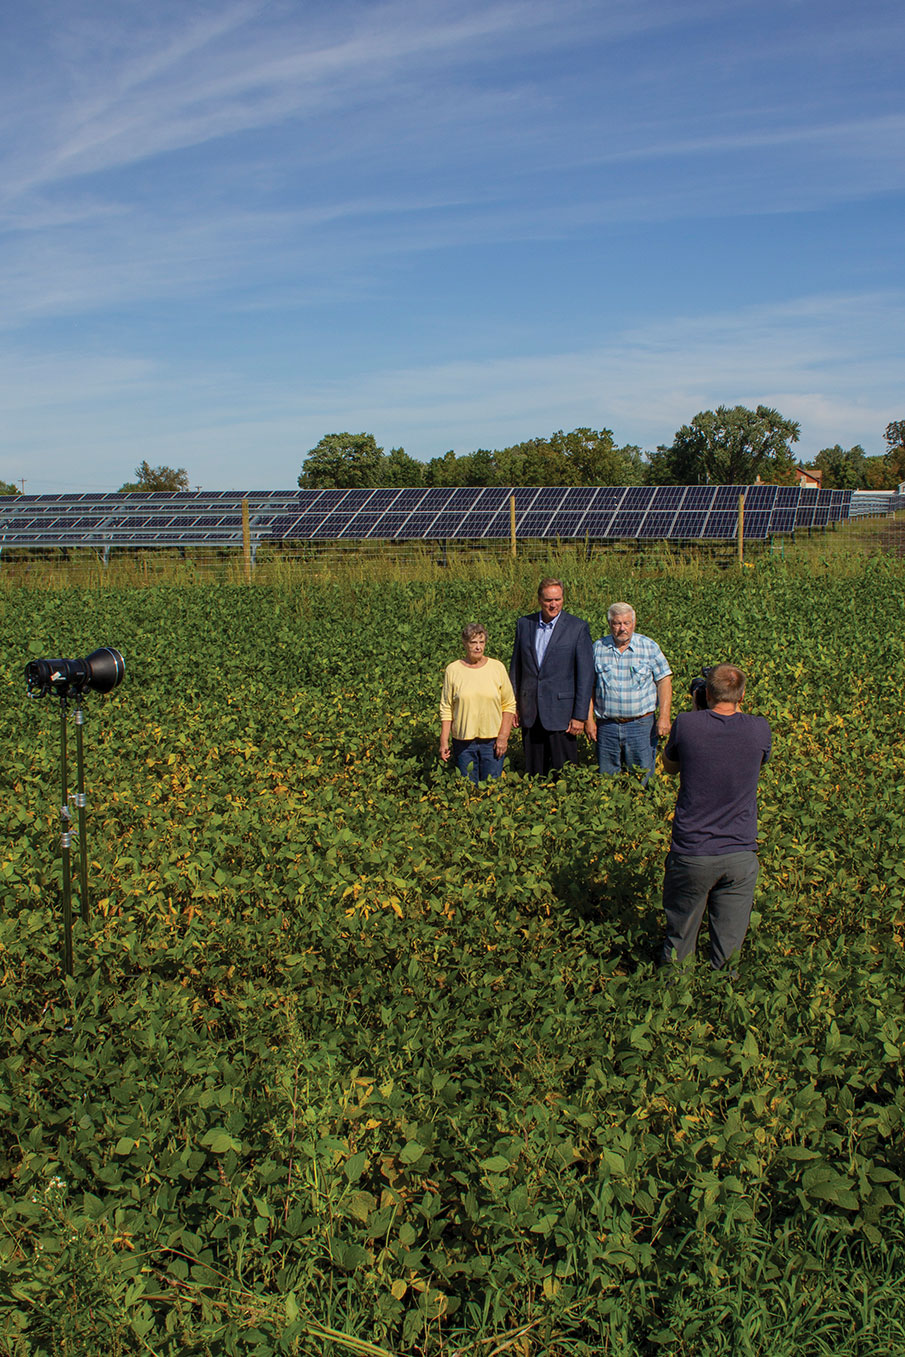 Greg Miller and Neilsens solar field